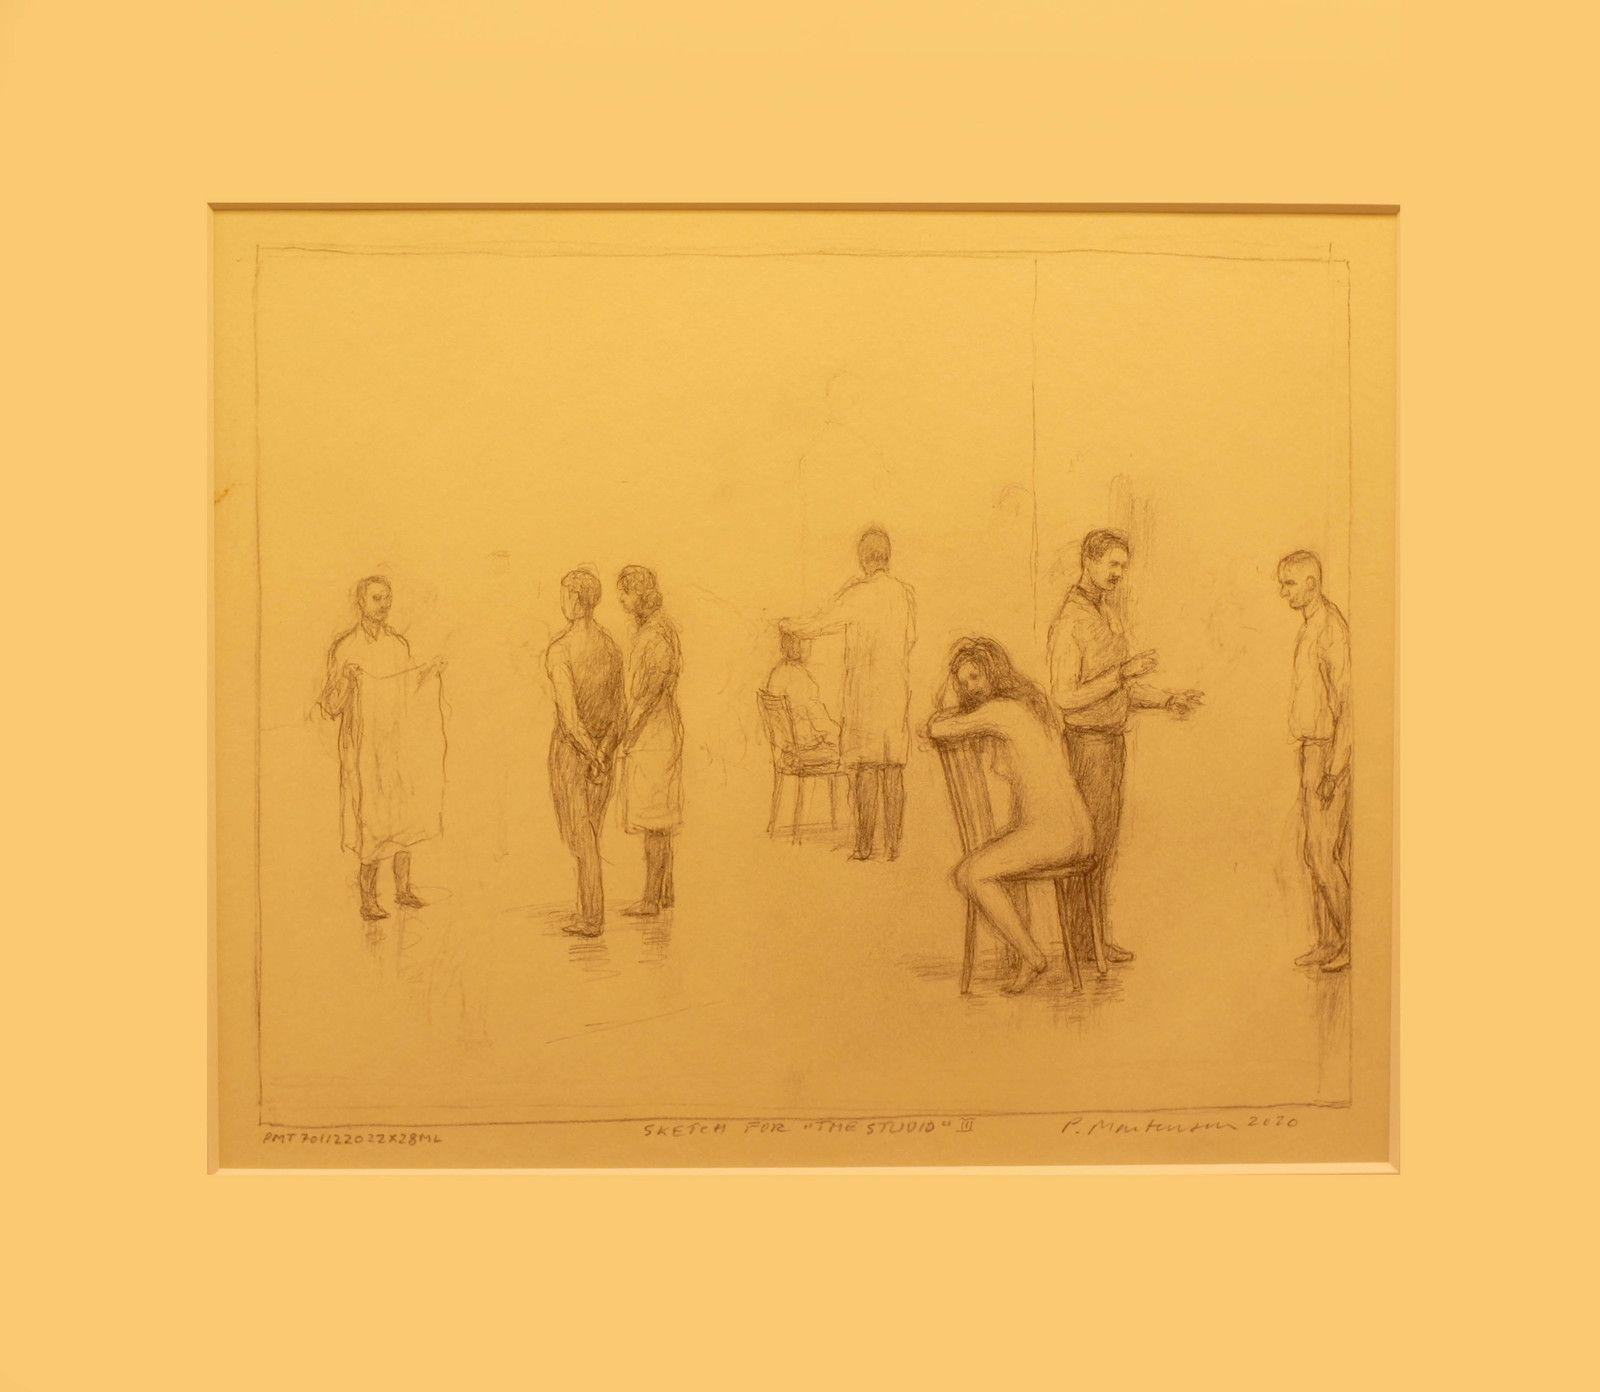 """Sketch for ""The Studio"" 2"", 2020 de Peter MARTENSEN - Courtesy de la Galerie Maria Lund © Photo Éric Simon"